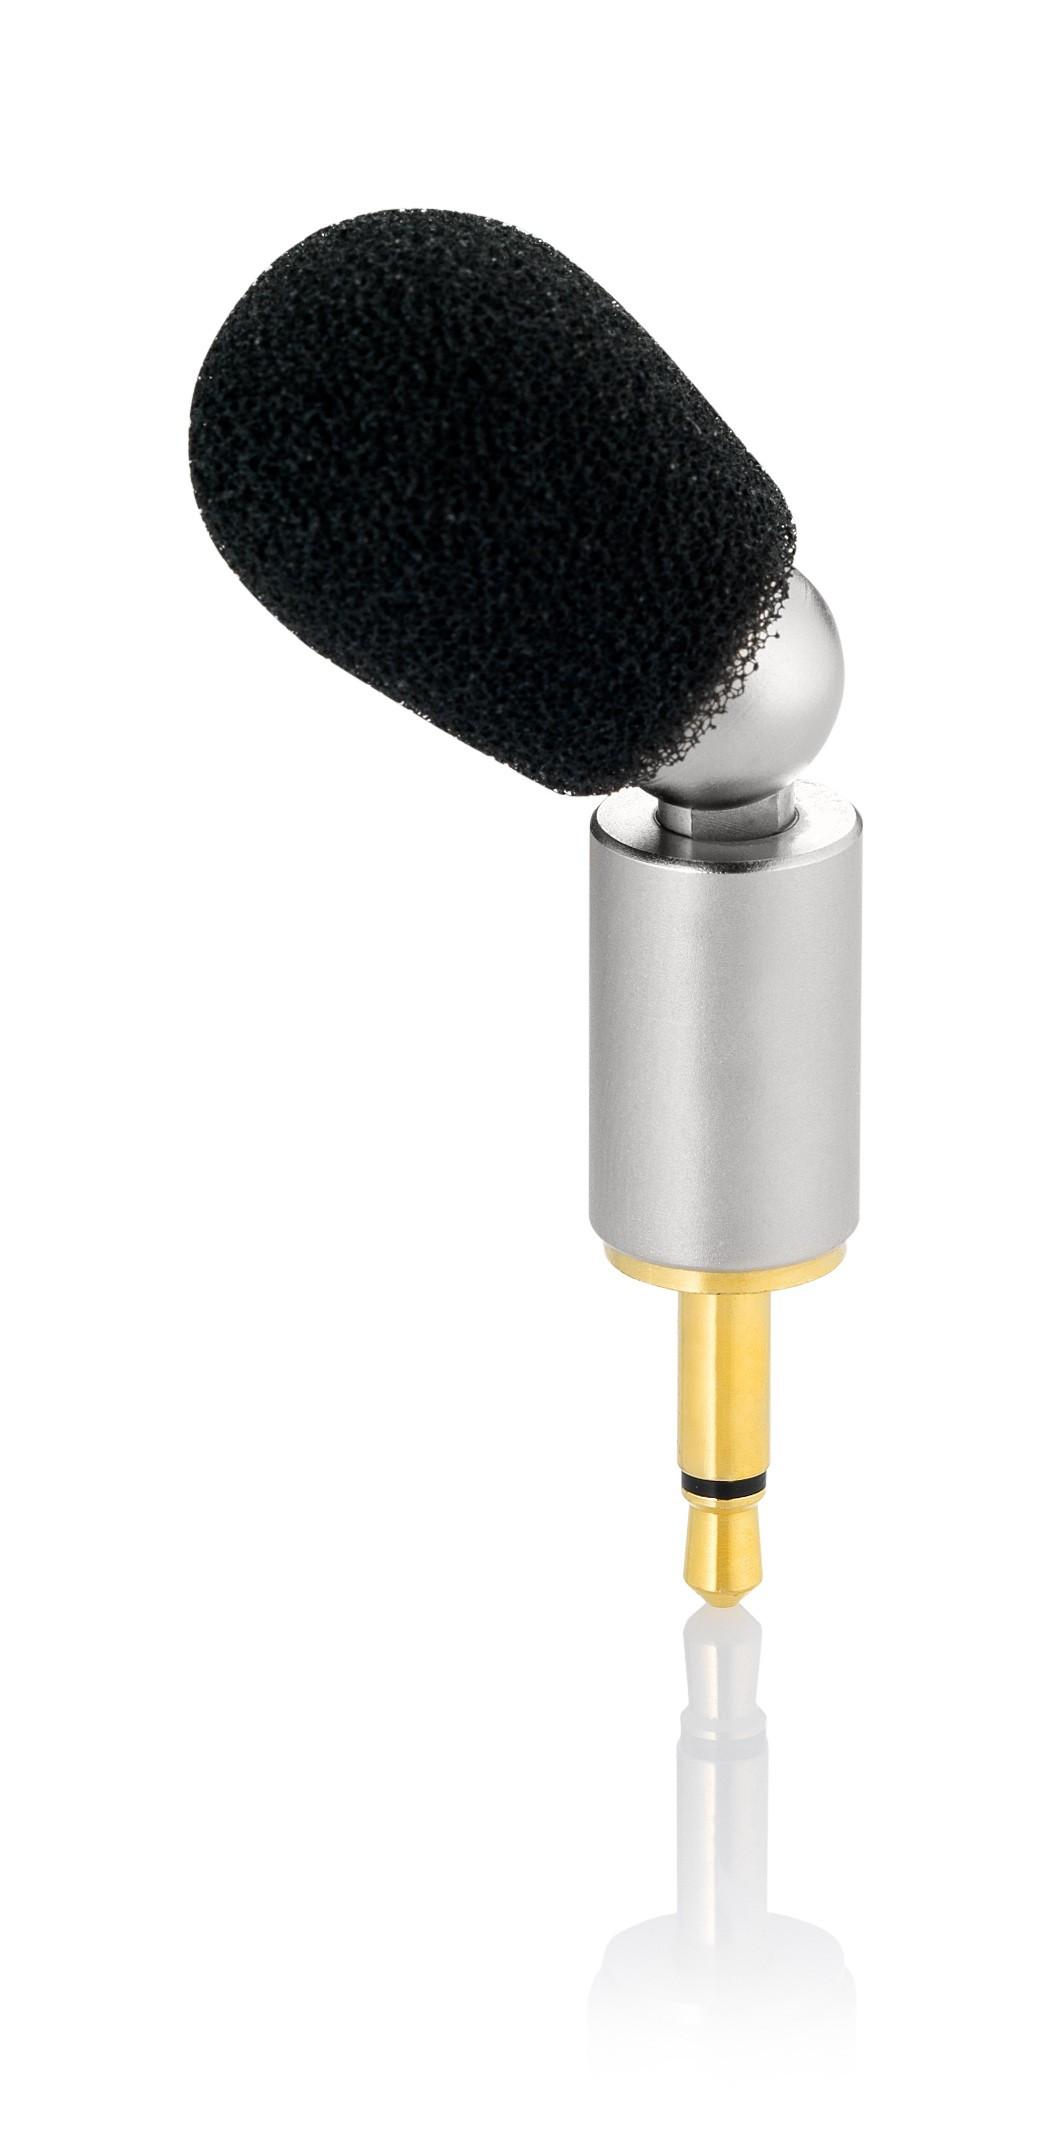 Philips LFH9171 Plug in mikrofon